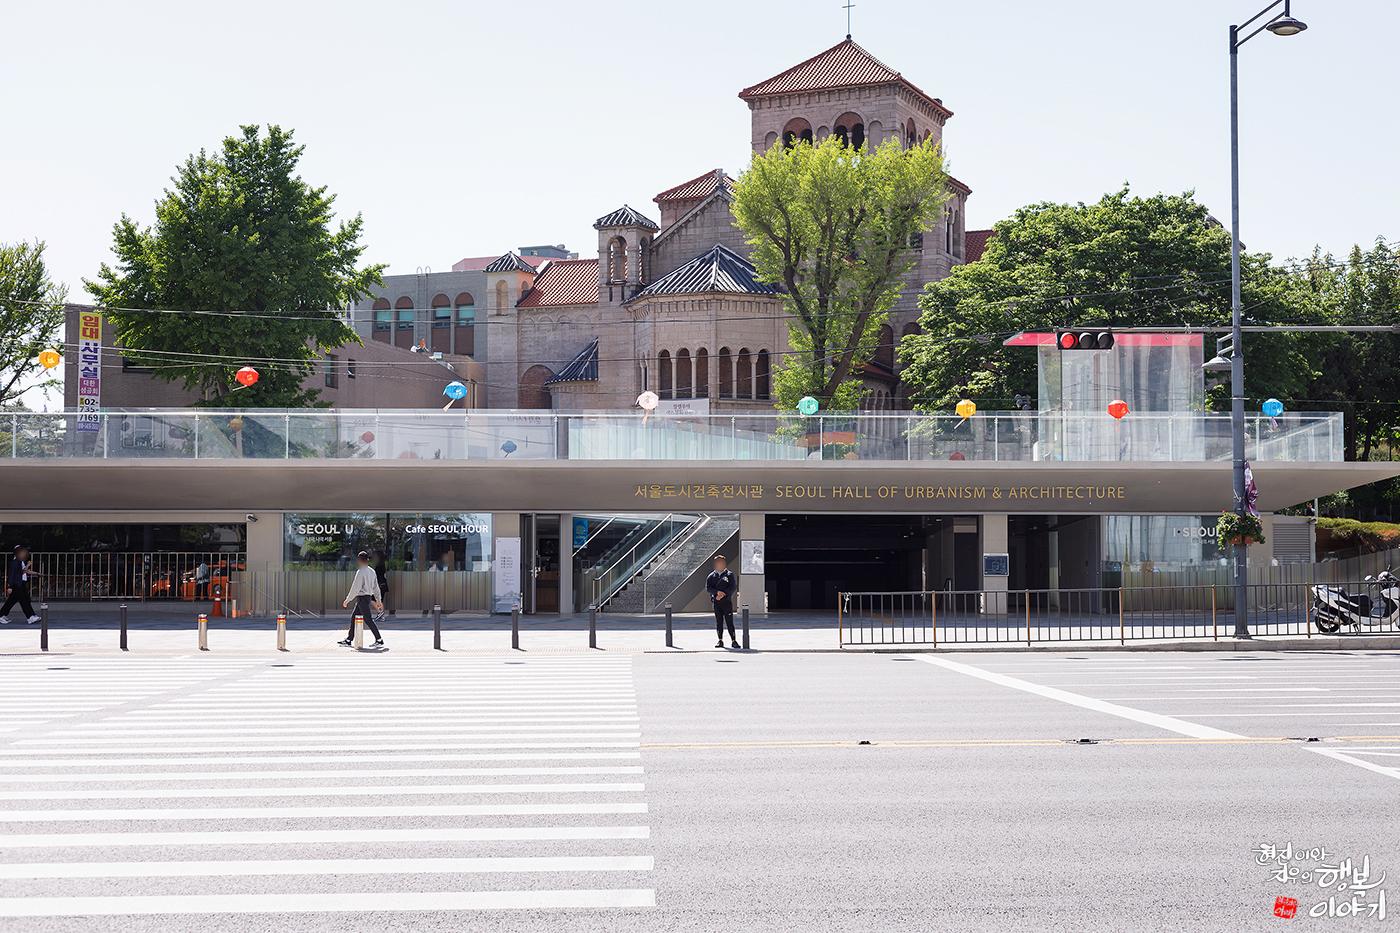 [EOS R] 서울도시 건축 전시관